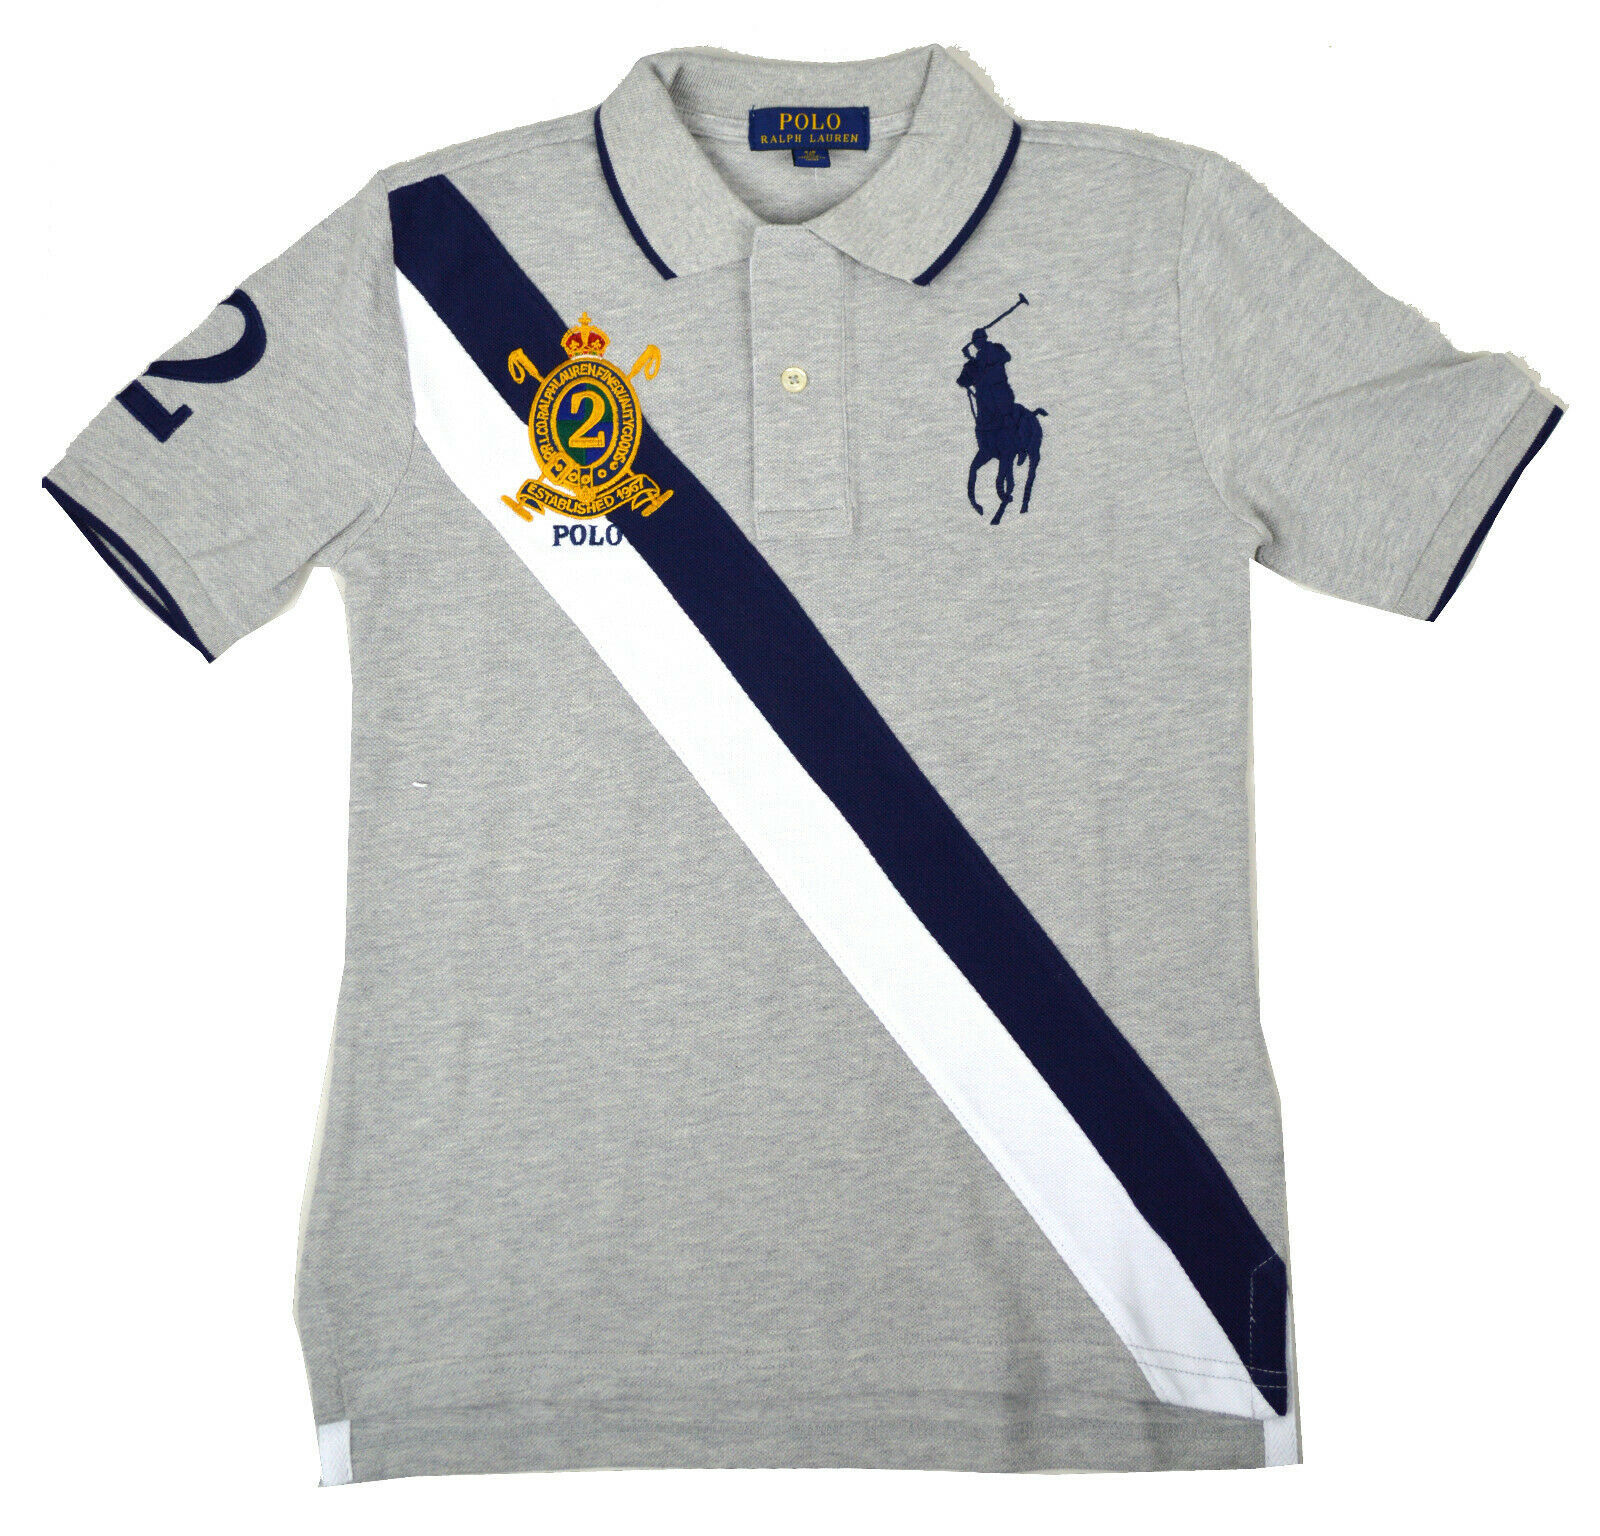 Polo Ralph Lauren Boys Kids ClassicFit Big Pony BannerStripe,L(14-18)Grey 9596-1